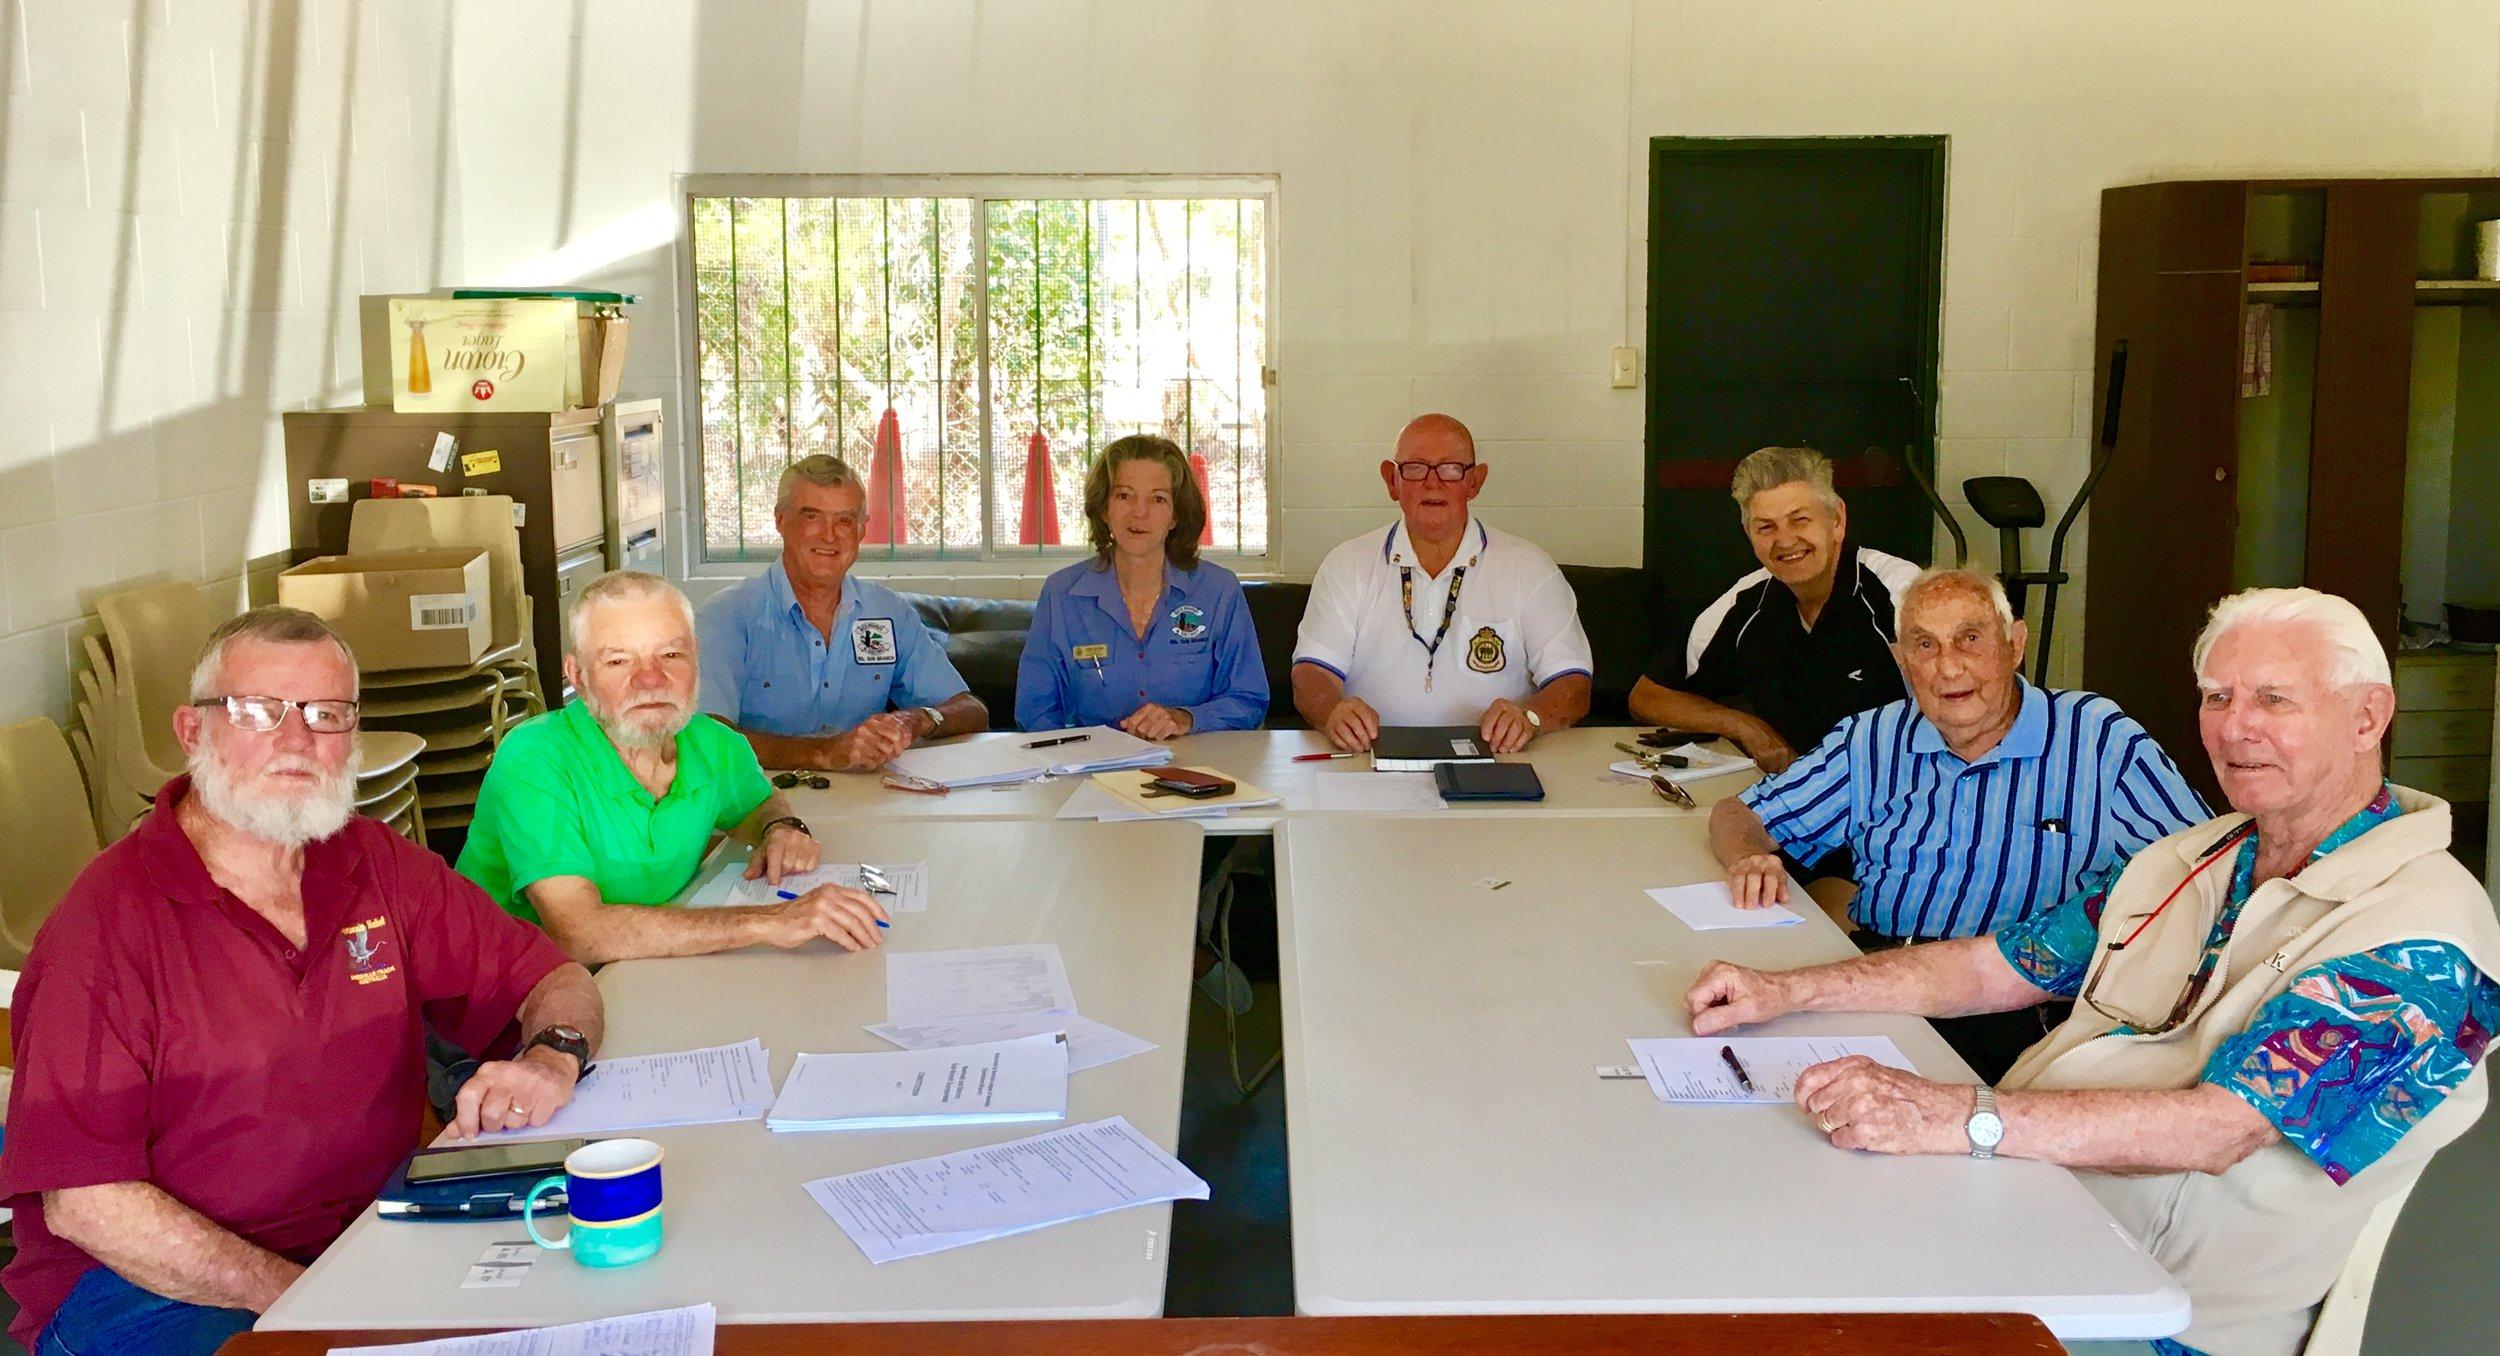 Beerwah & District RSL Sub-branch members: Damian, Leo, John, Libby, John (President), Ray, Ken and Ron.